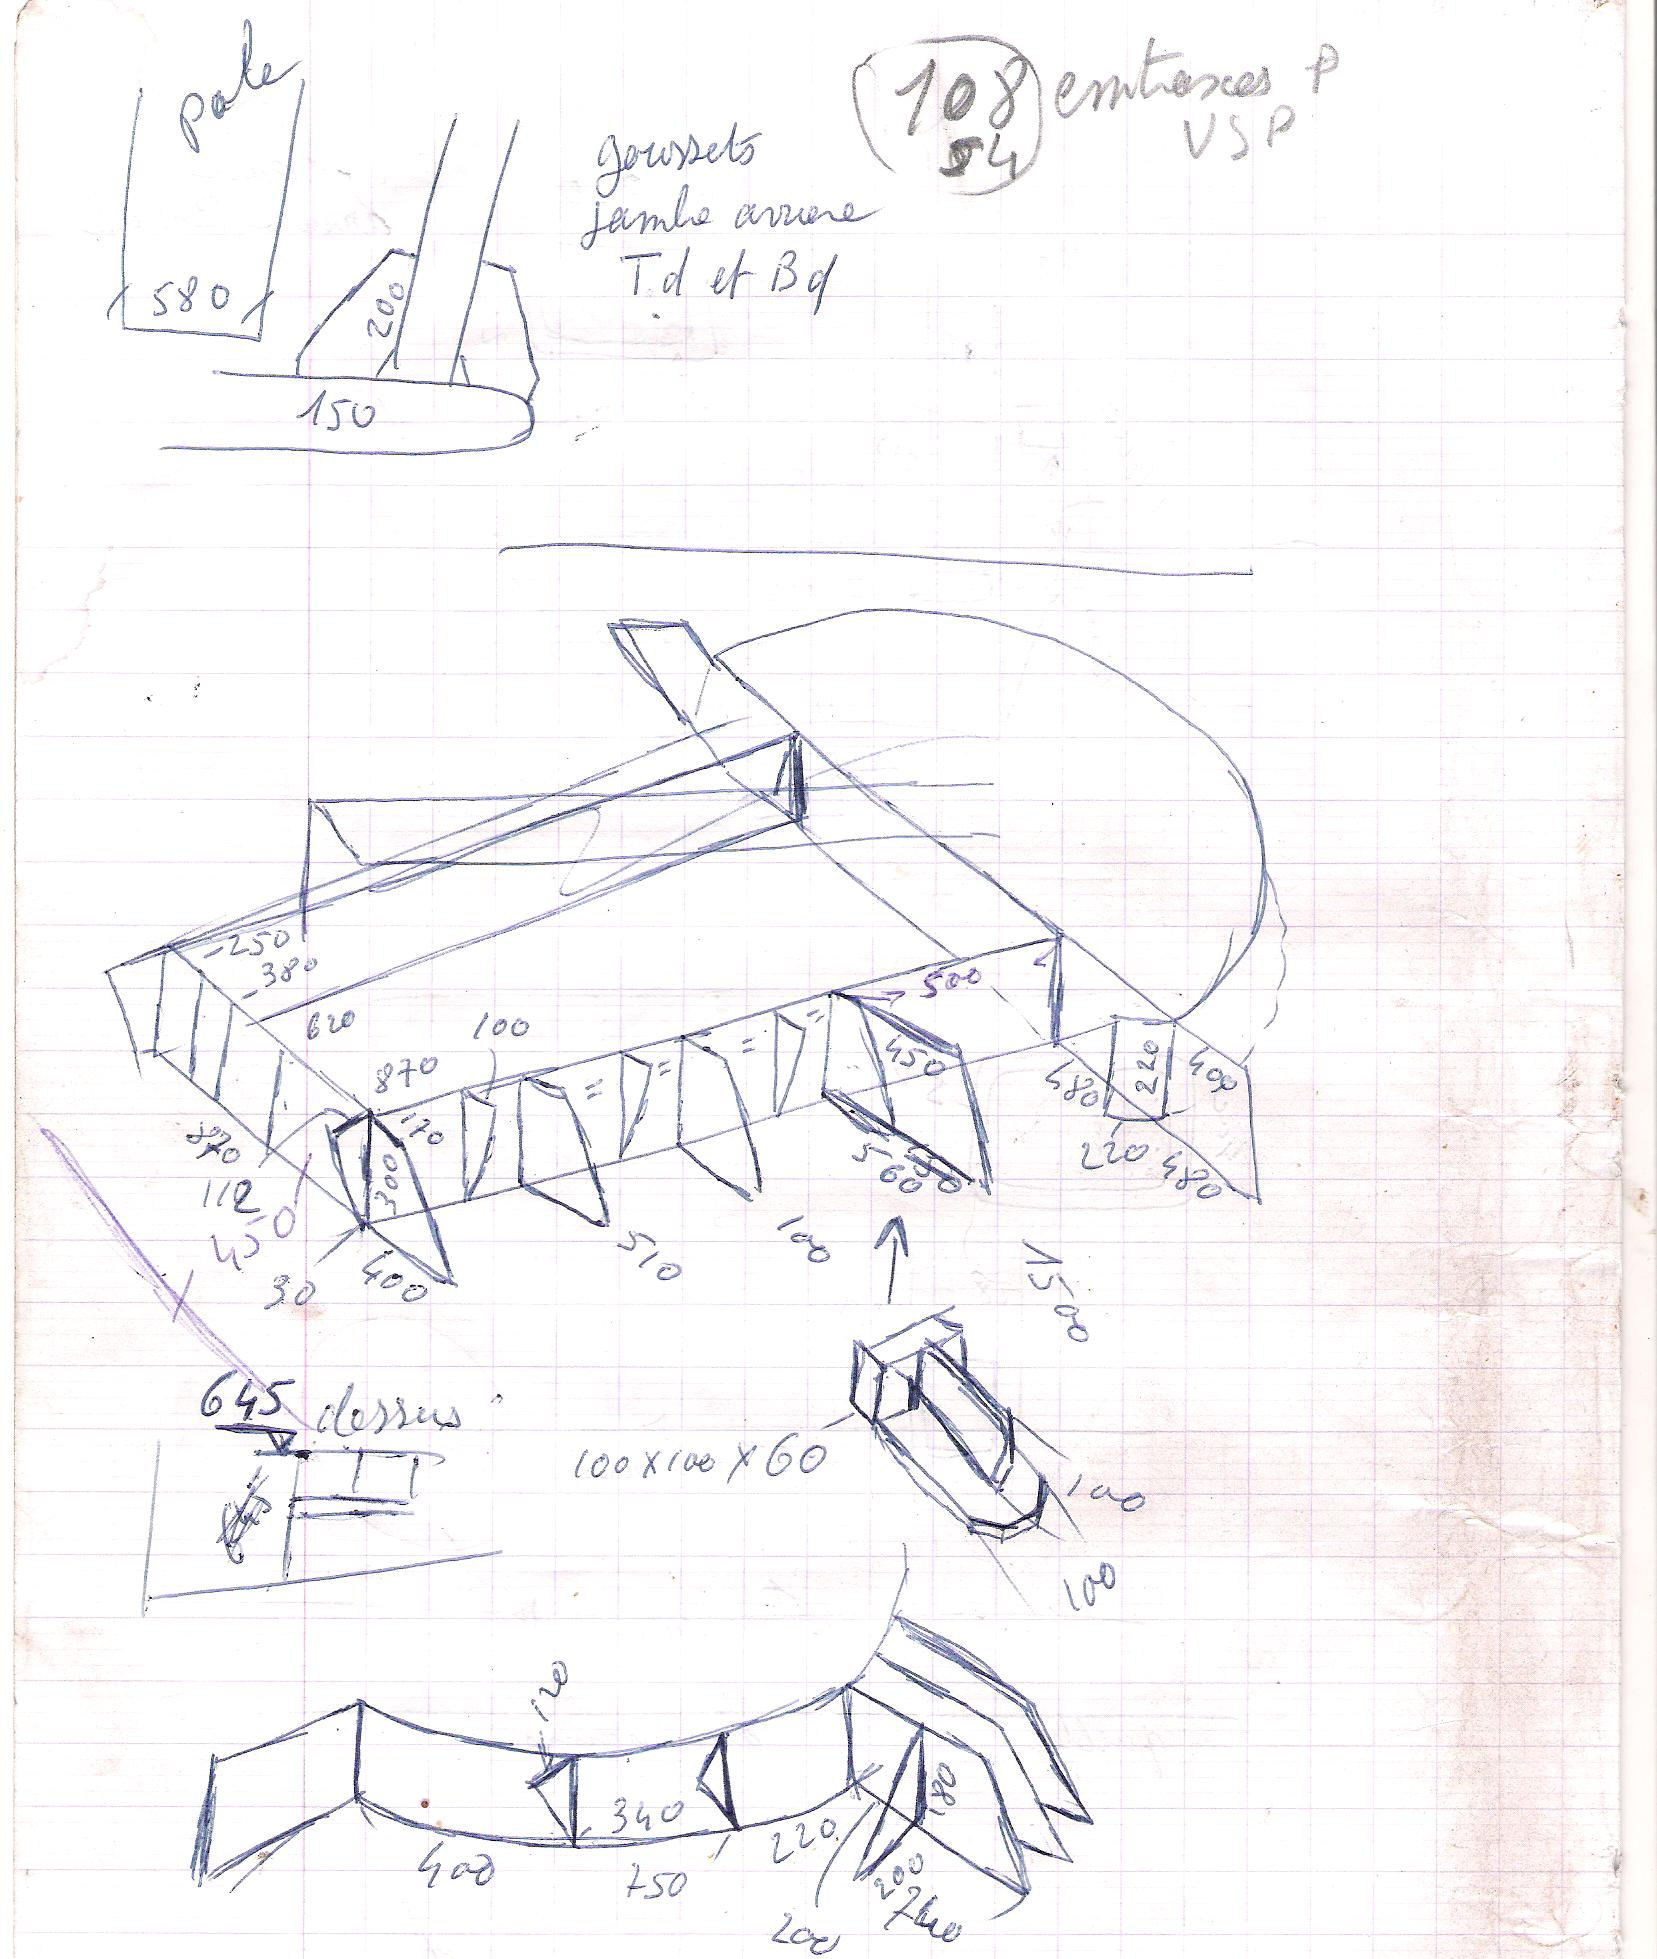 Choisir mon remorqueur (VSP tractor tug) - Page 3 15101308282629976